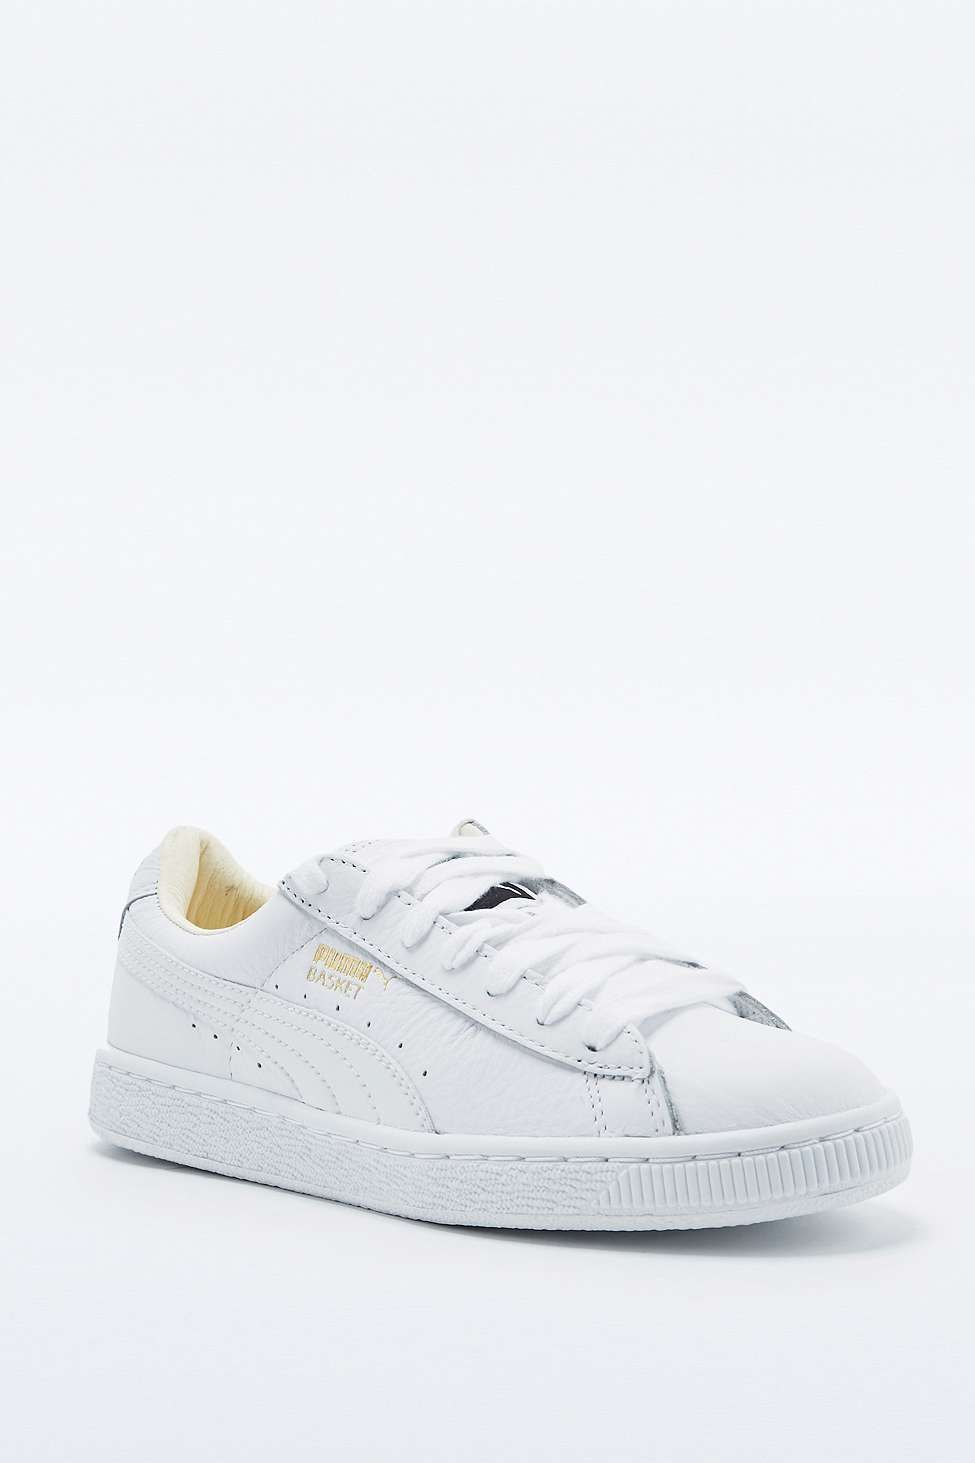 Puma - Baskets classiques en cuir blanches